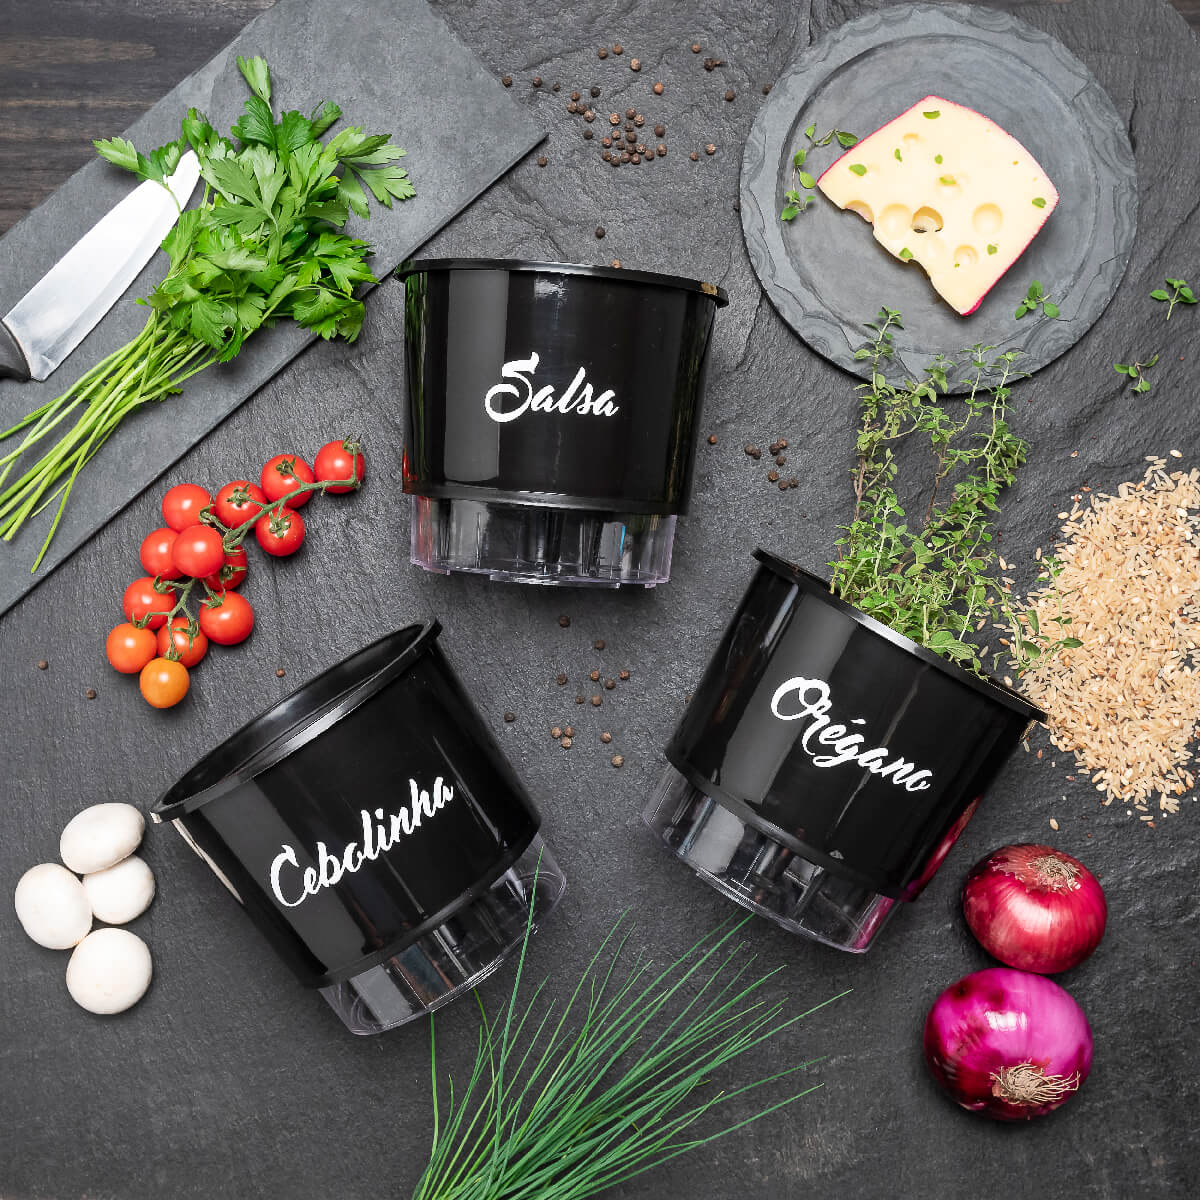 Kit Plantio Completo Gourmet Risoto  - Loja Raiz